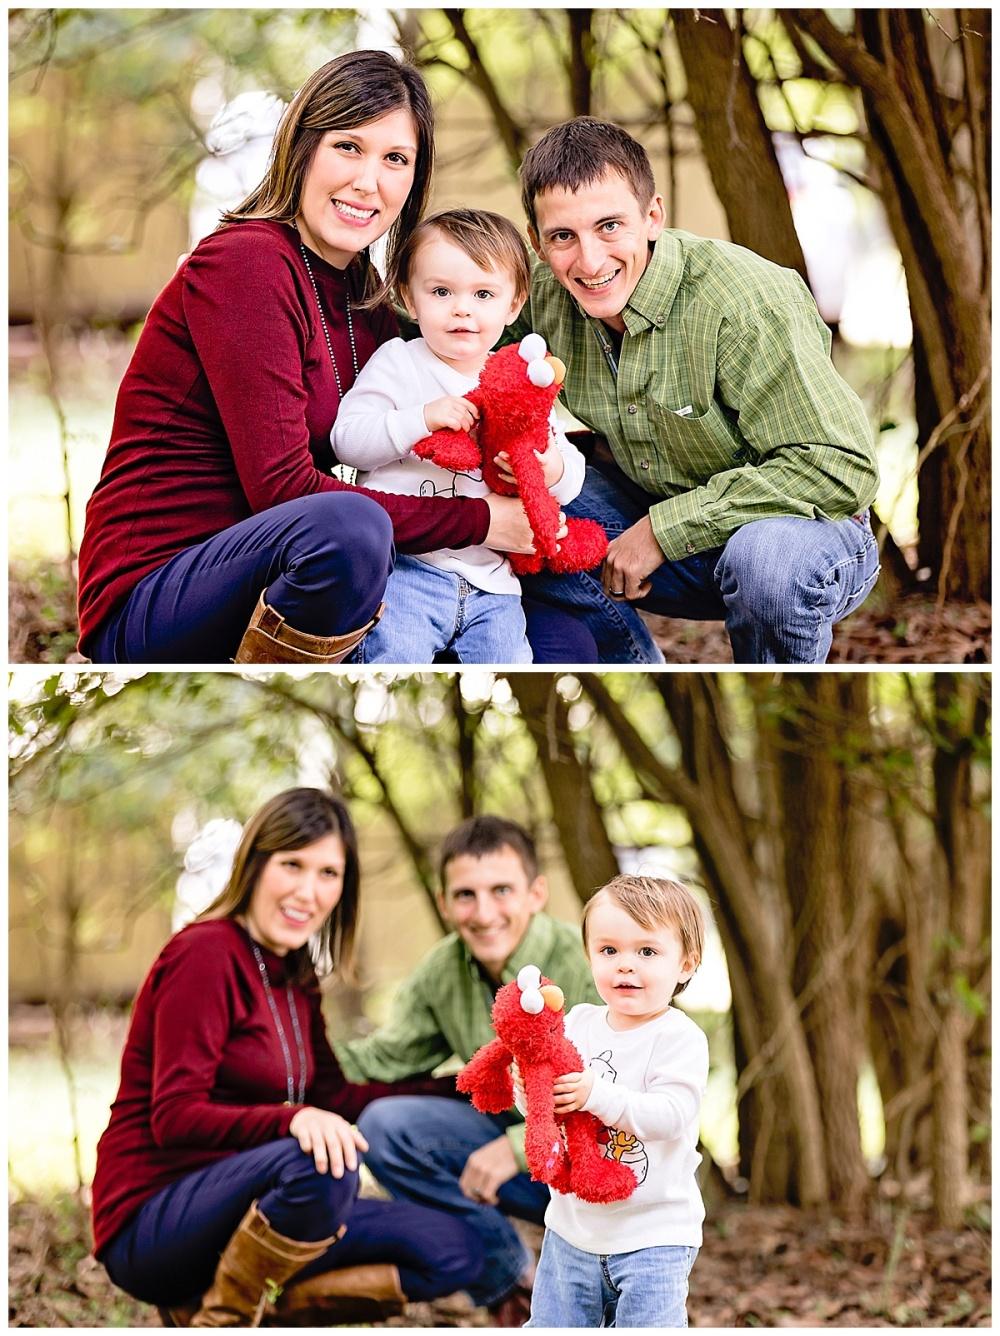 Family-Photographer-Gruene-Texas-Fall-Carly-Barton-Photography_0004.jpg